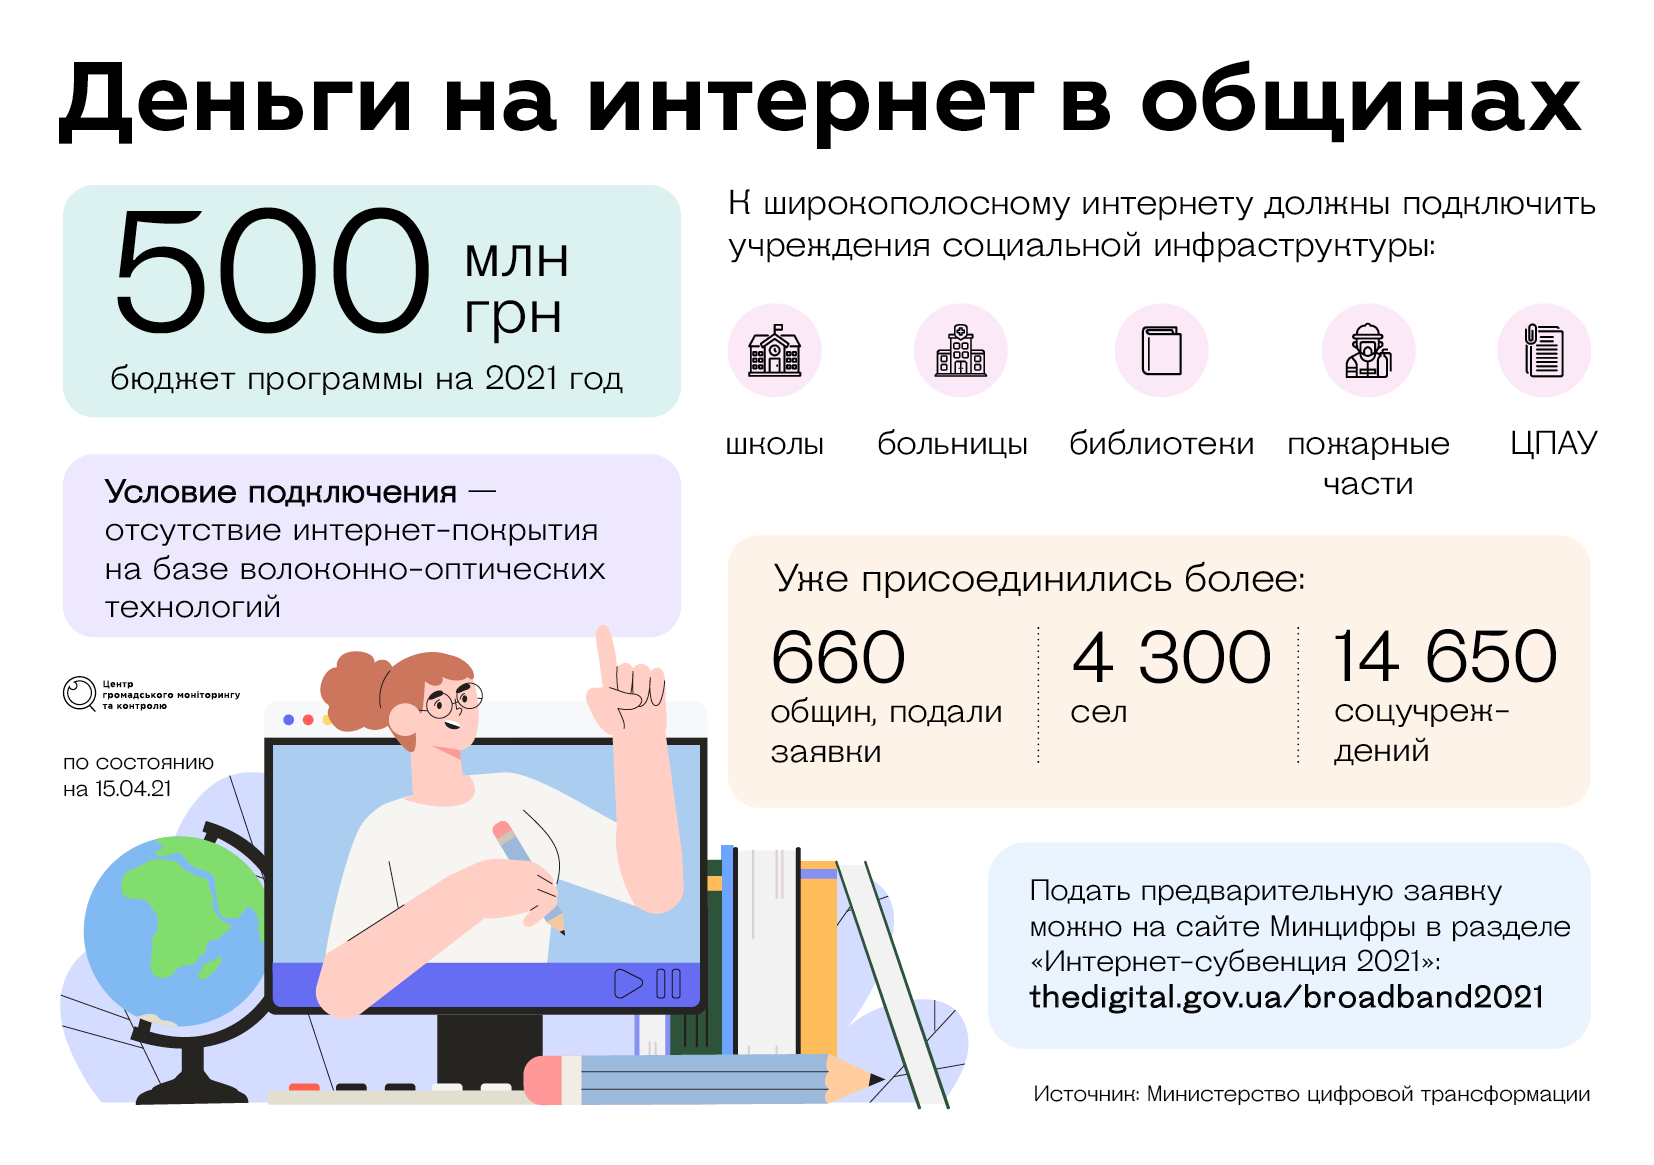 Интернет в села